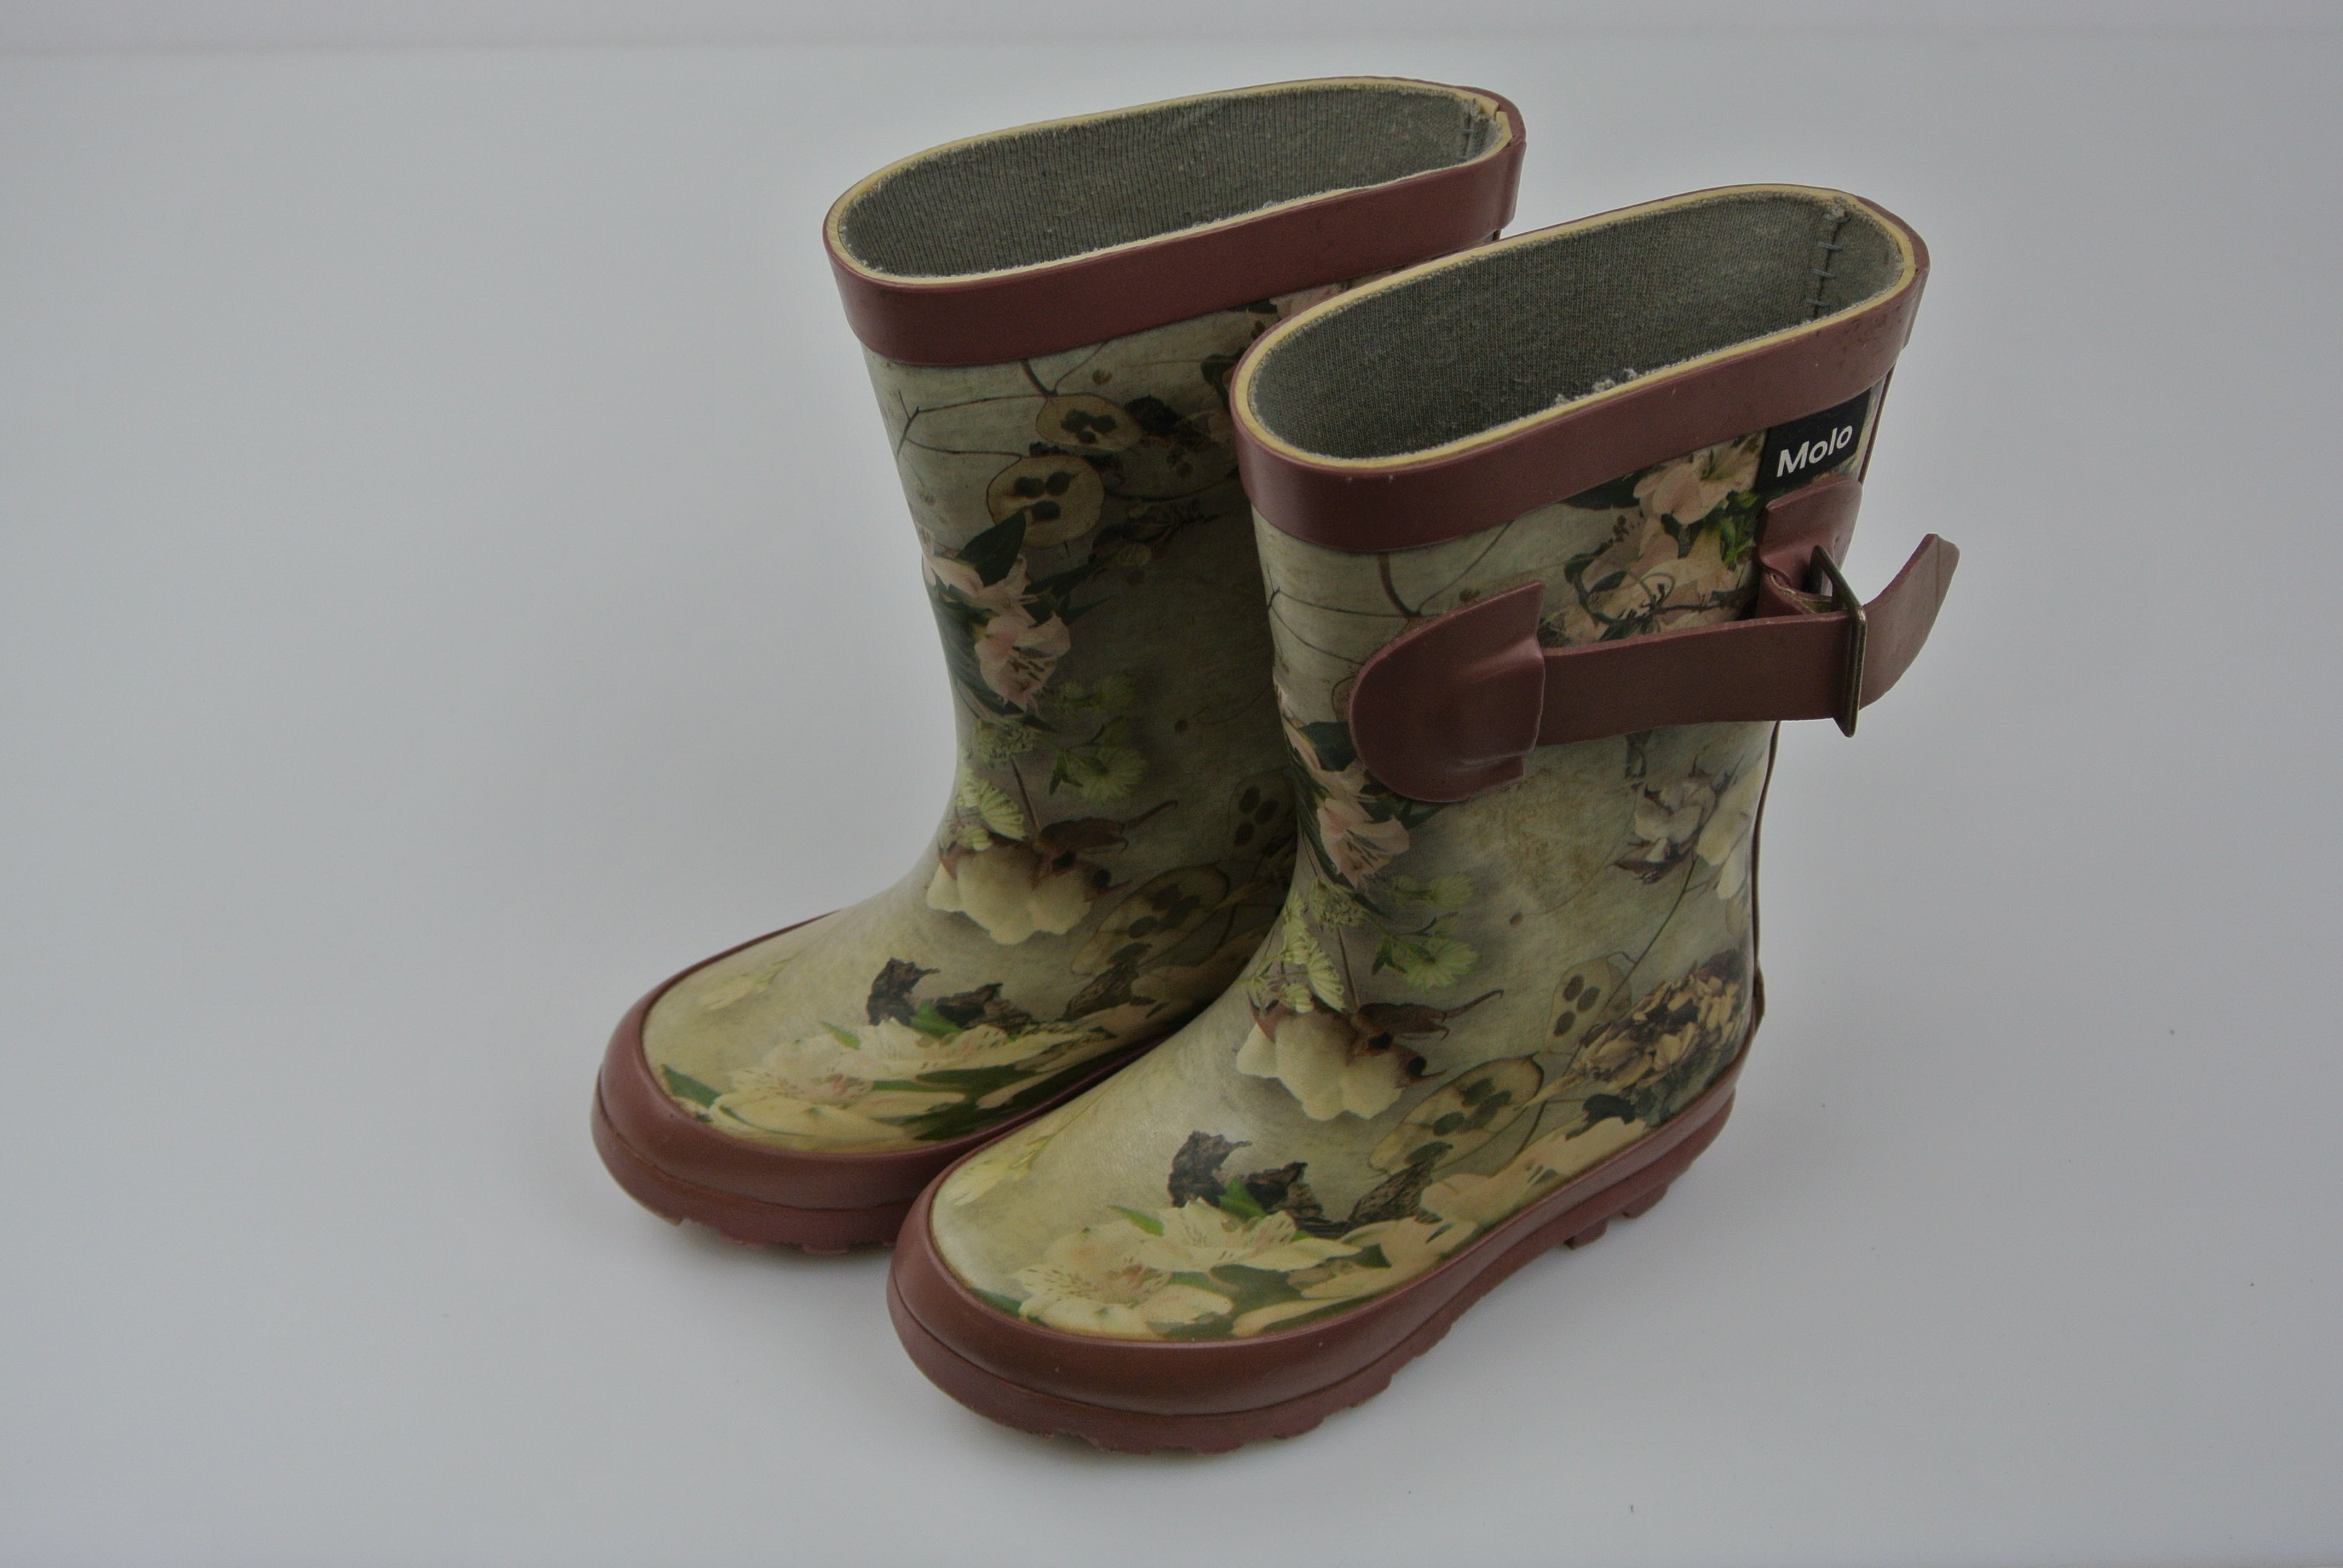 Molo sko str 25 gummistøvler